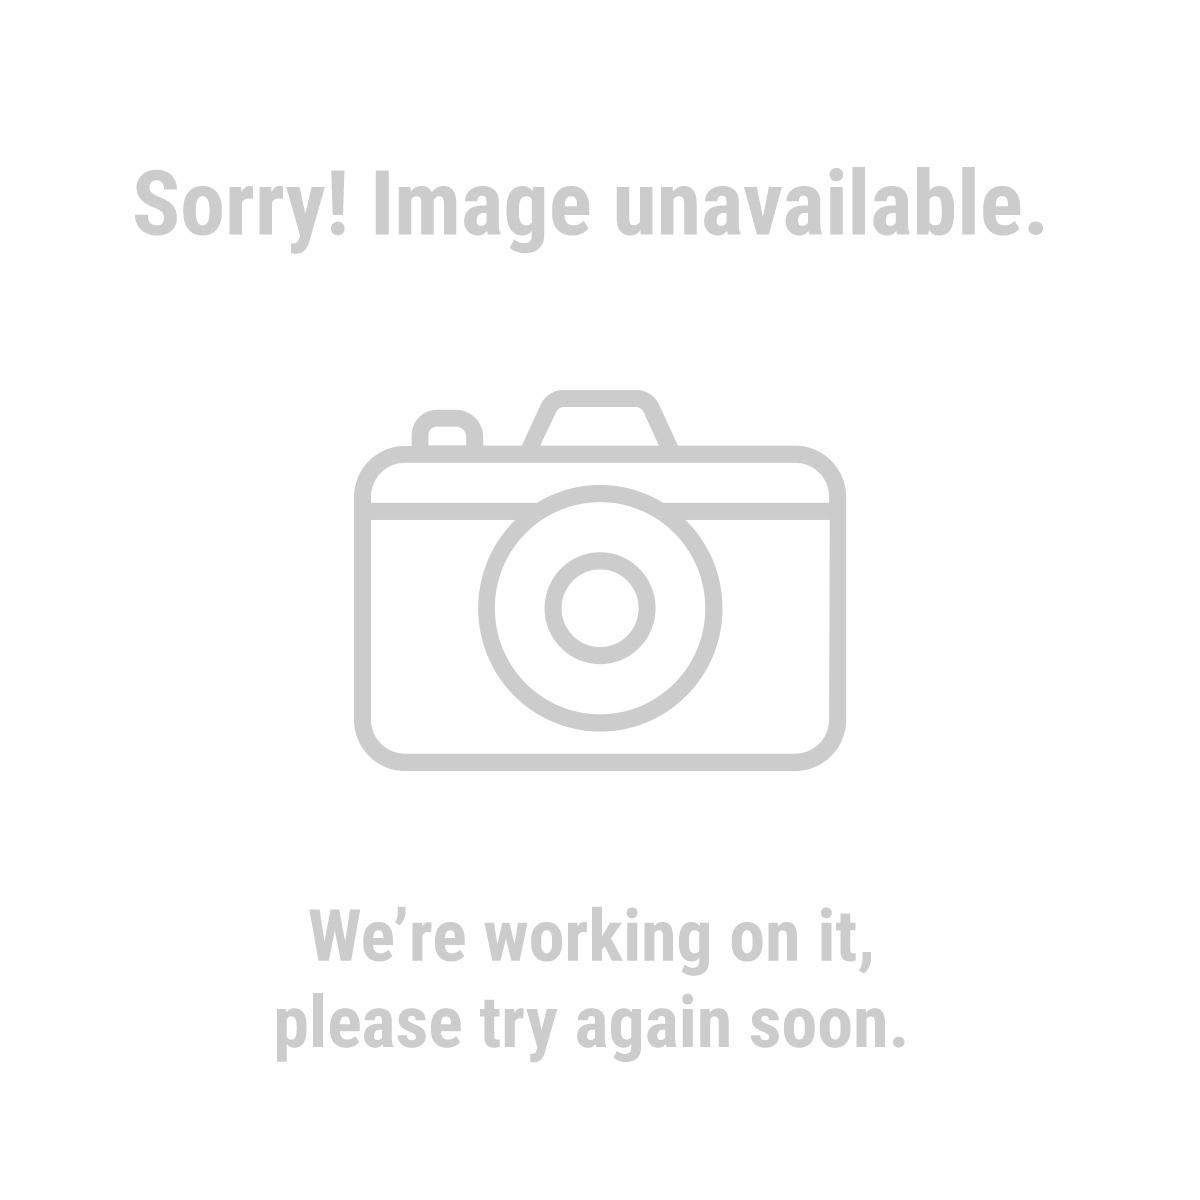 U.S. General® 98084 13 Drawer Black Onyx Industrial Quality Roller Cabinet